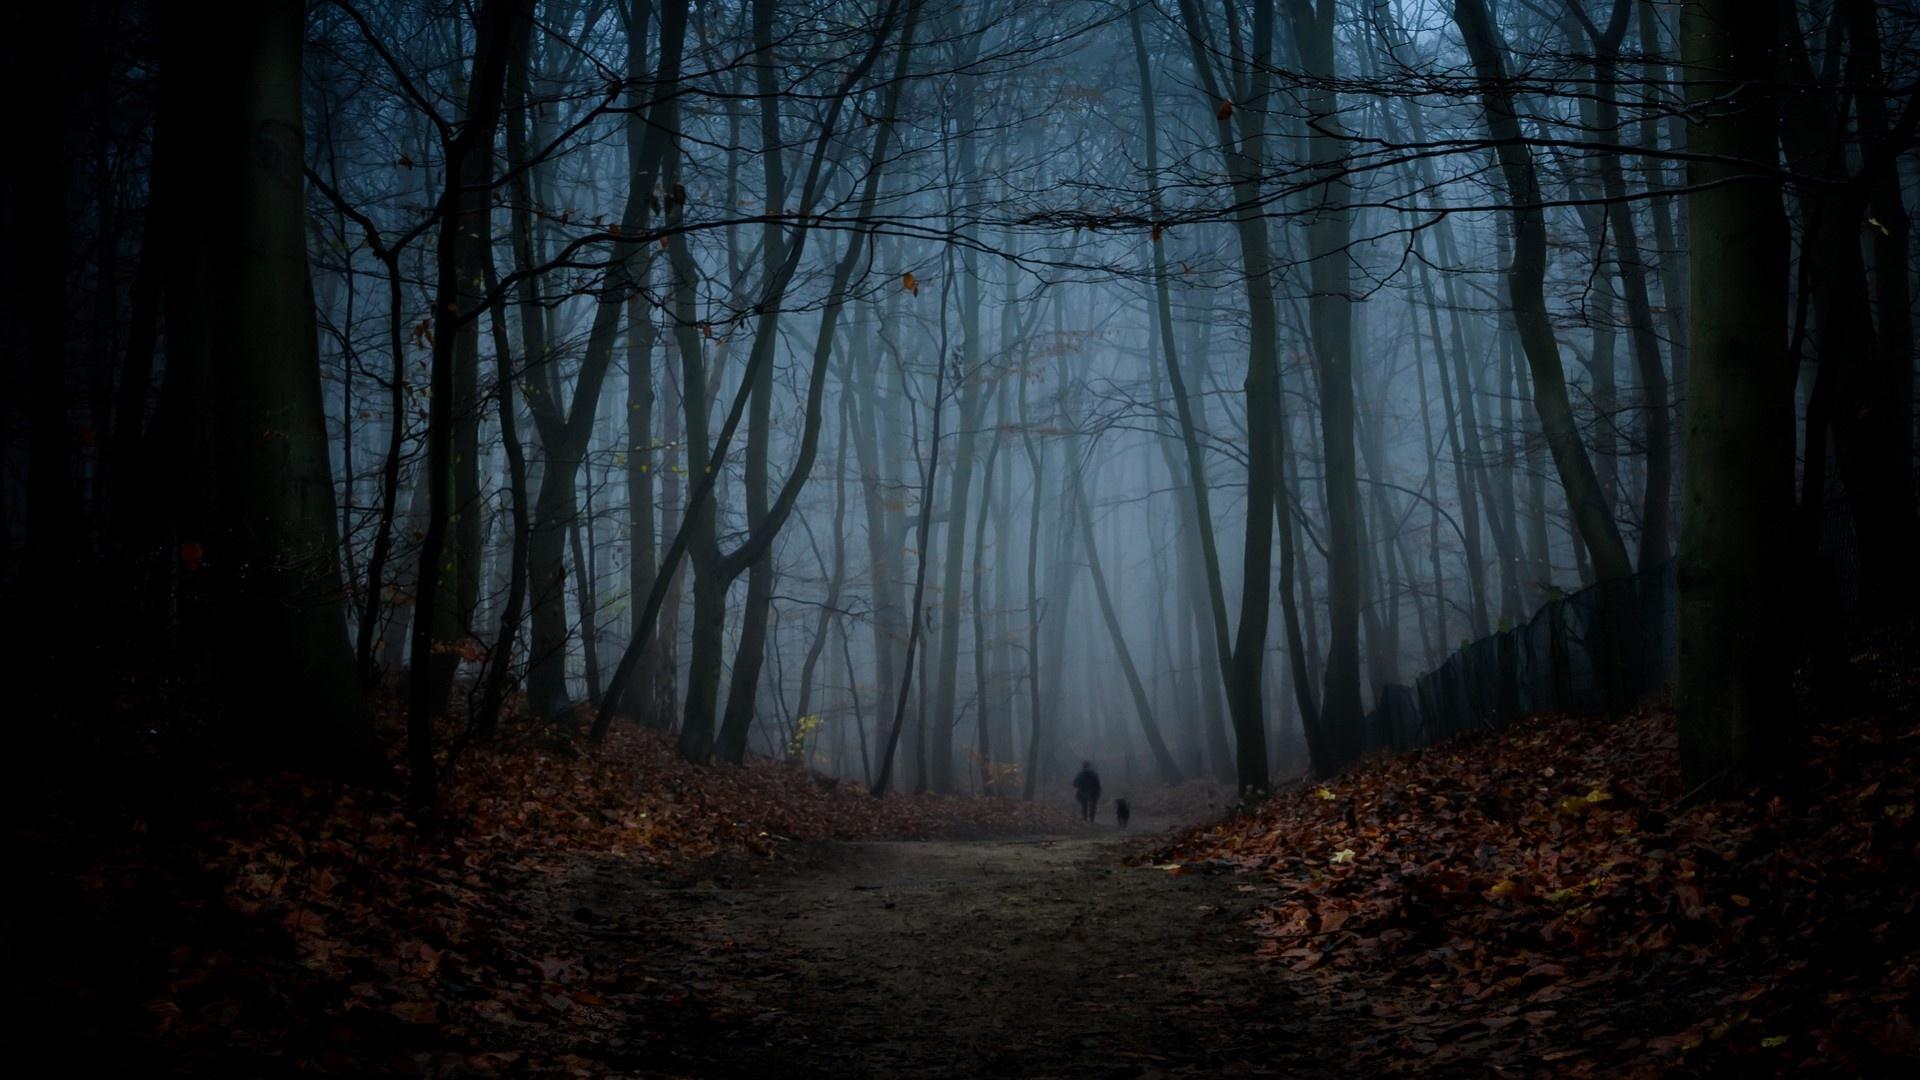 Dark Autumn Wallpaper image hd